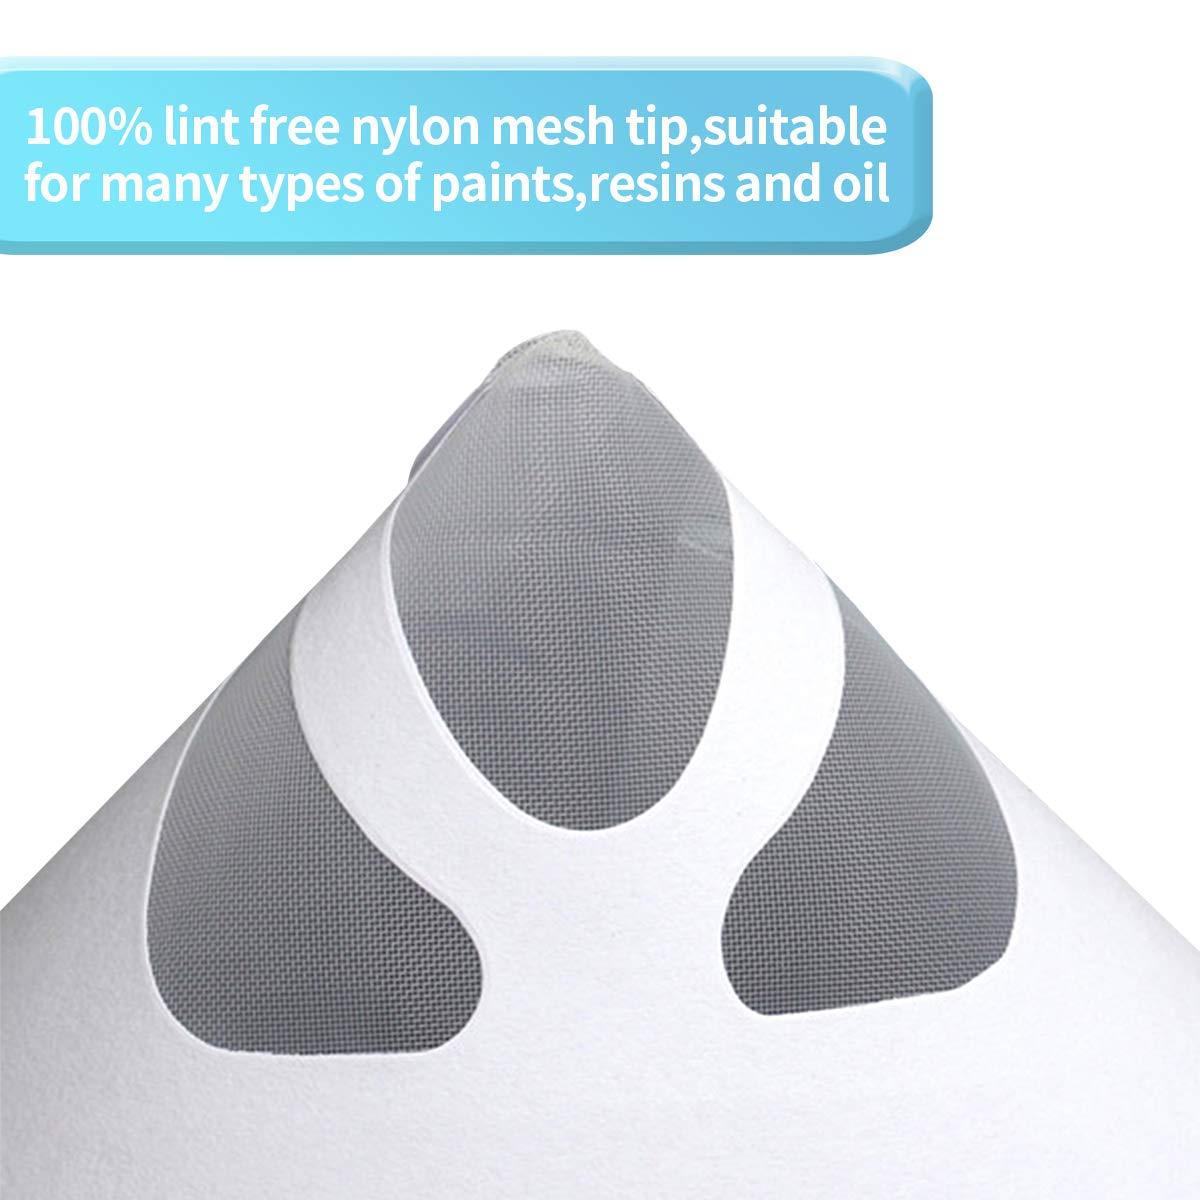 Jeteven 150 Unidades de coladores de Papel de Pintura Desechables con 1 Filtro de Silicona versi/ón actualizada